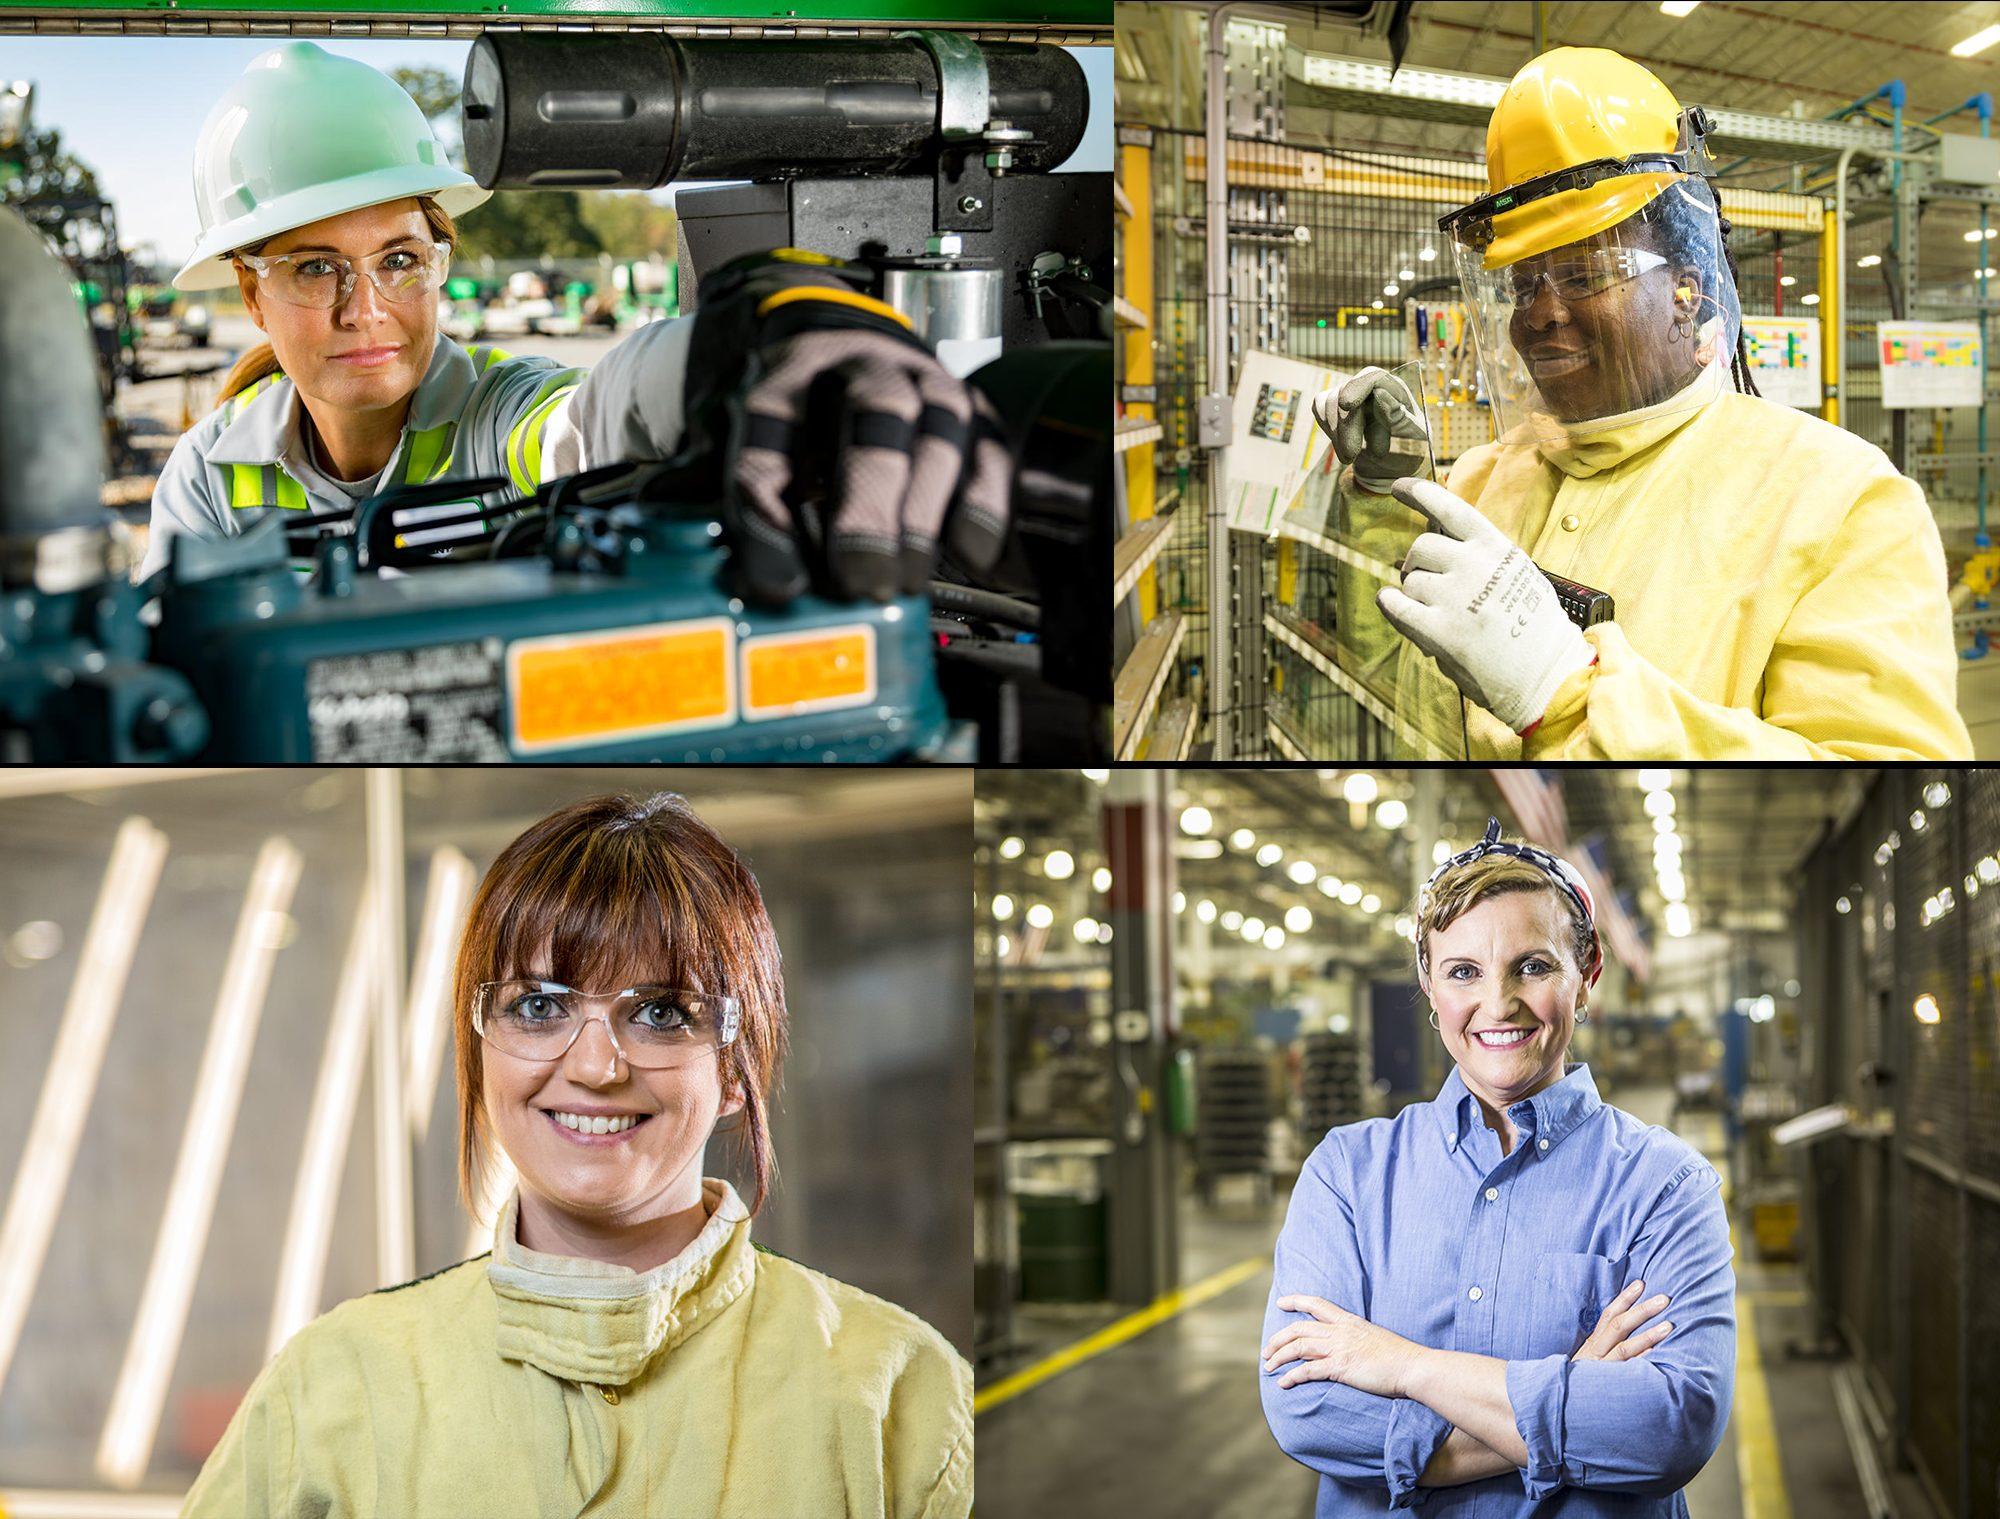 women-industrial-manufacturing-lobiondophotography